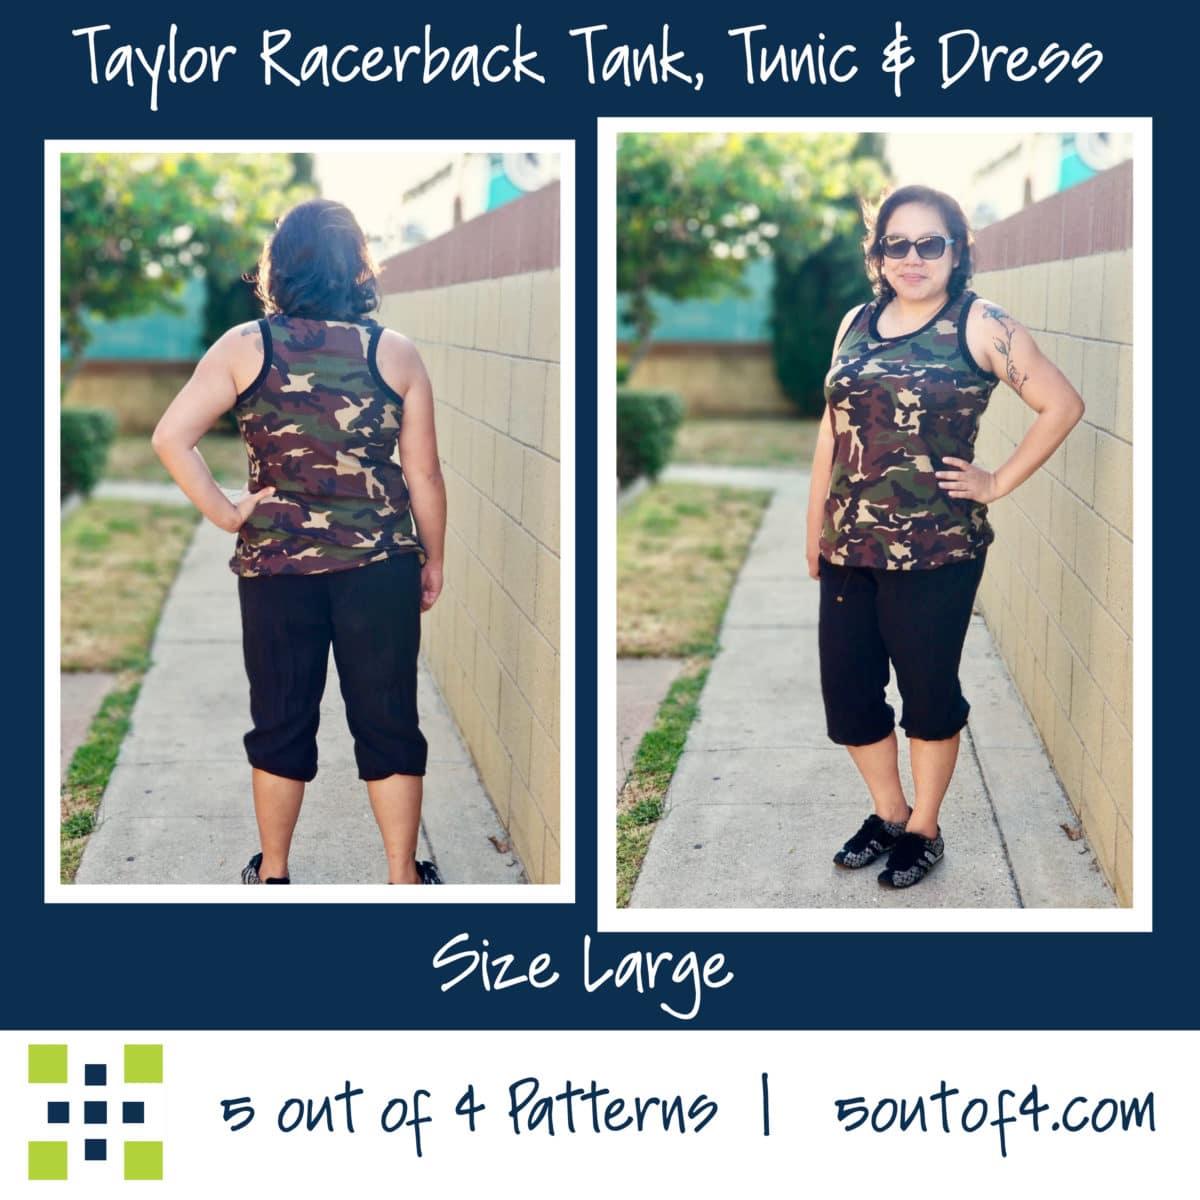 Taylor Racerback Tank